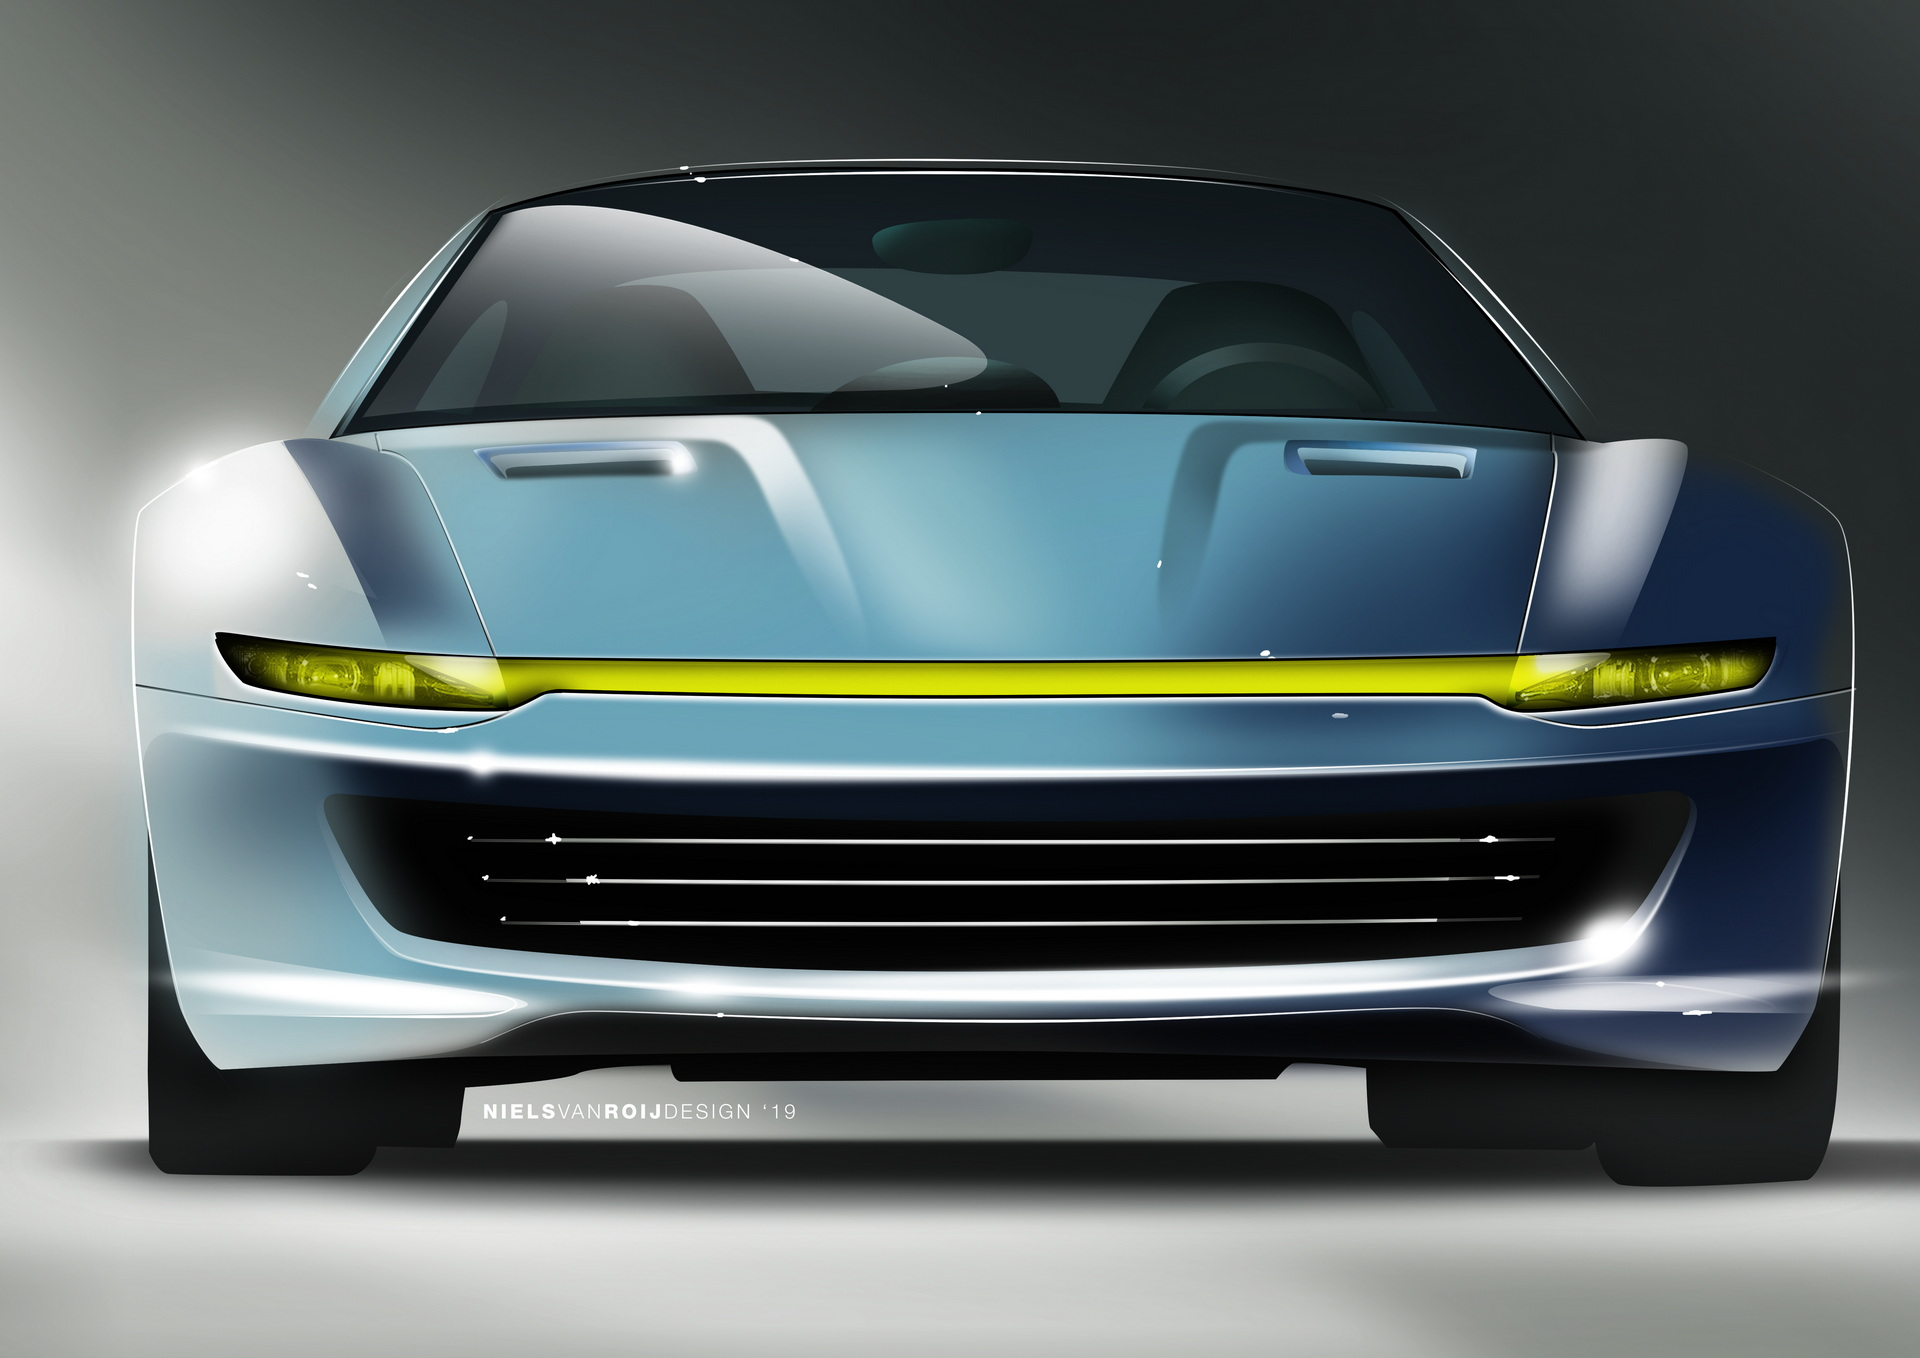 Ferrari-Daytona-Shooting-Brake-Hommage-by-Niels-van-Roij-Design-34